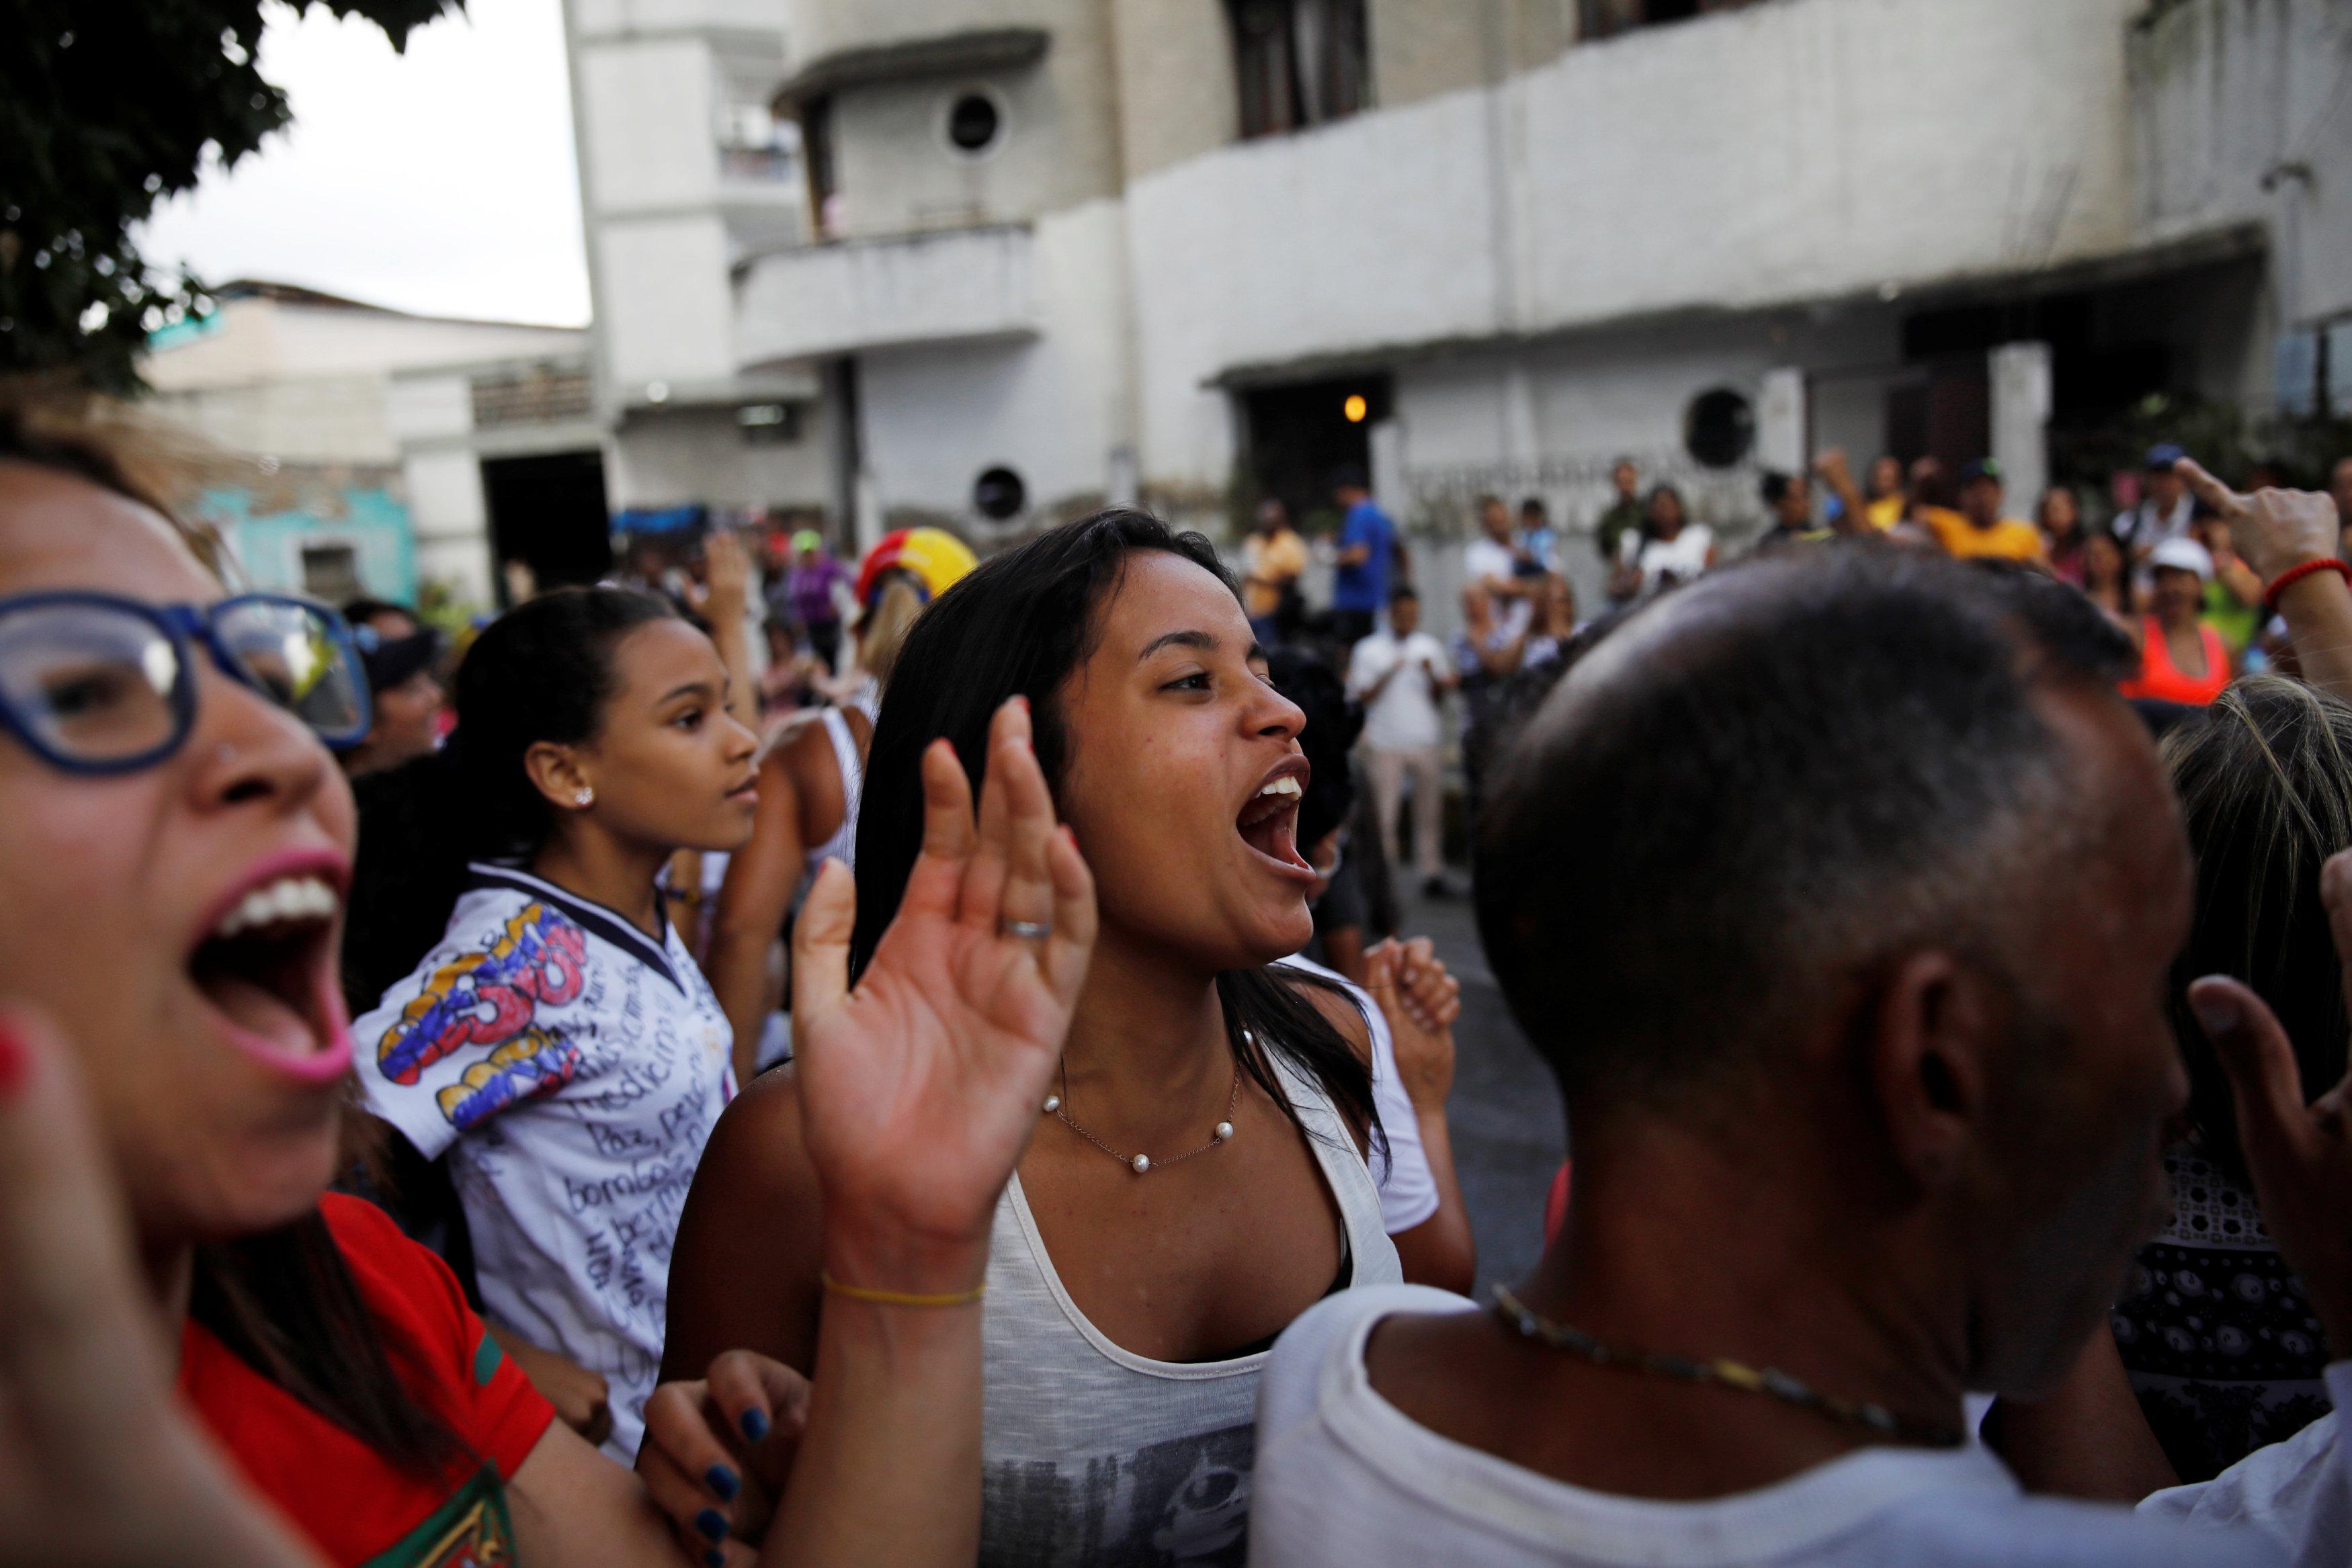 2017 07 17T000917Z 58930279 RC1A417DC1E0 RTRMADP 3 VENEZUELA POLITICS